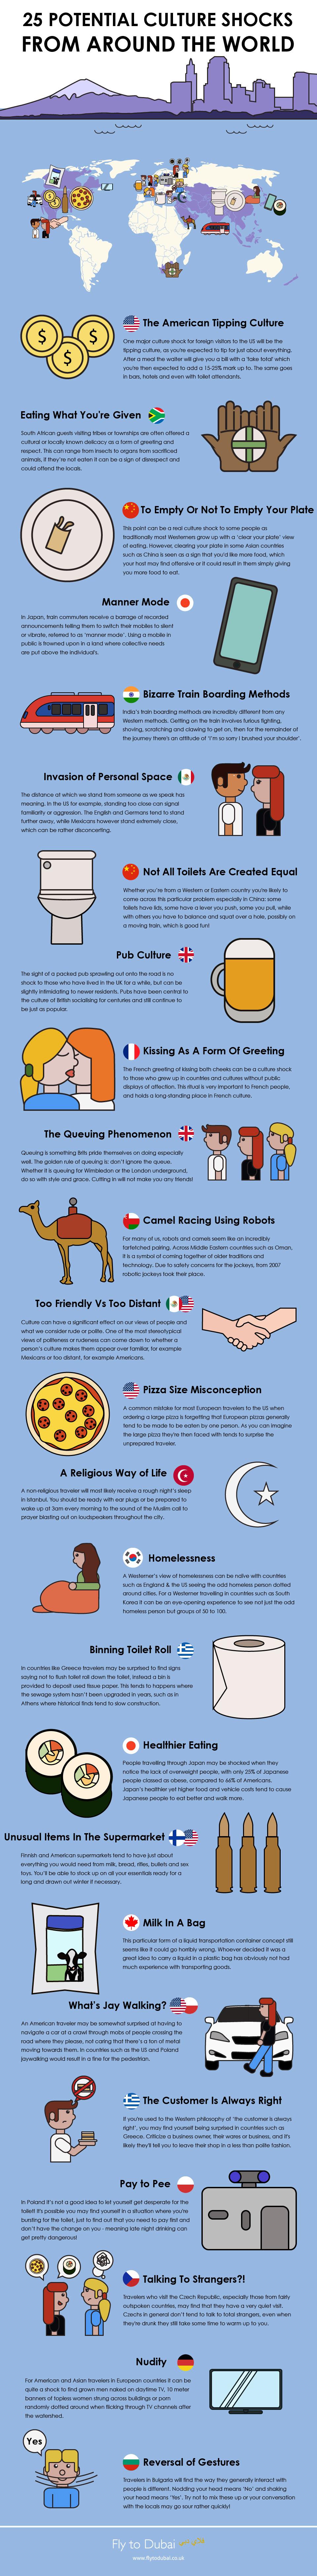 infographic-culture-shock-around-world